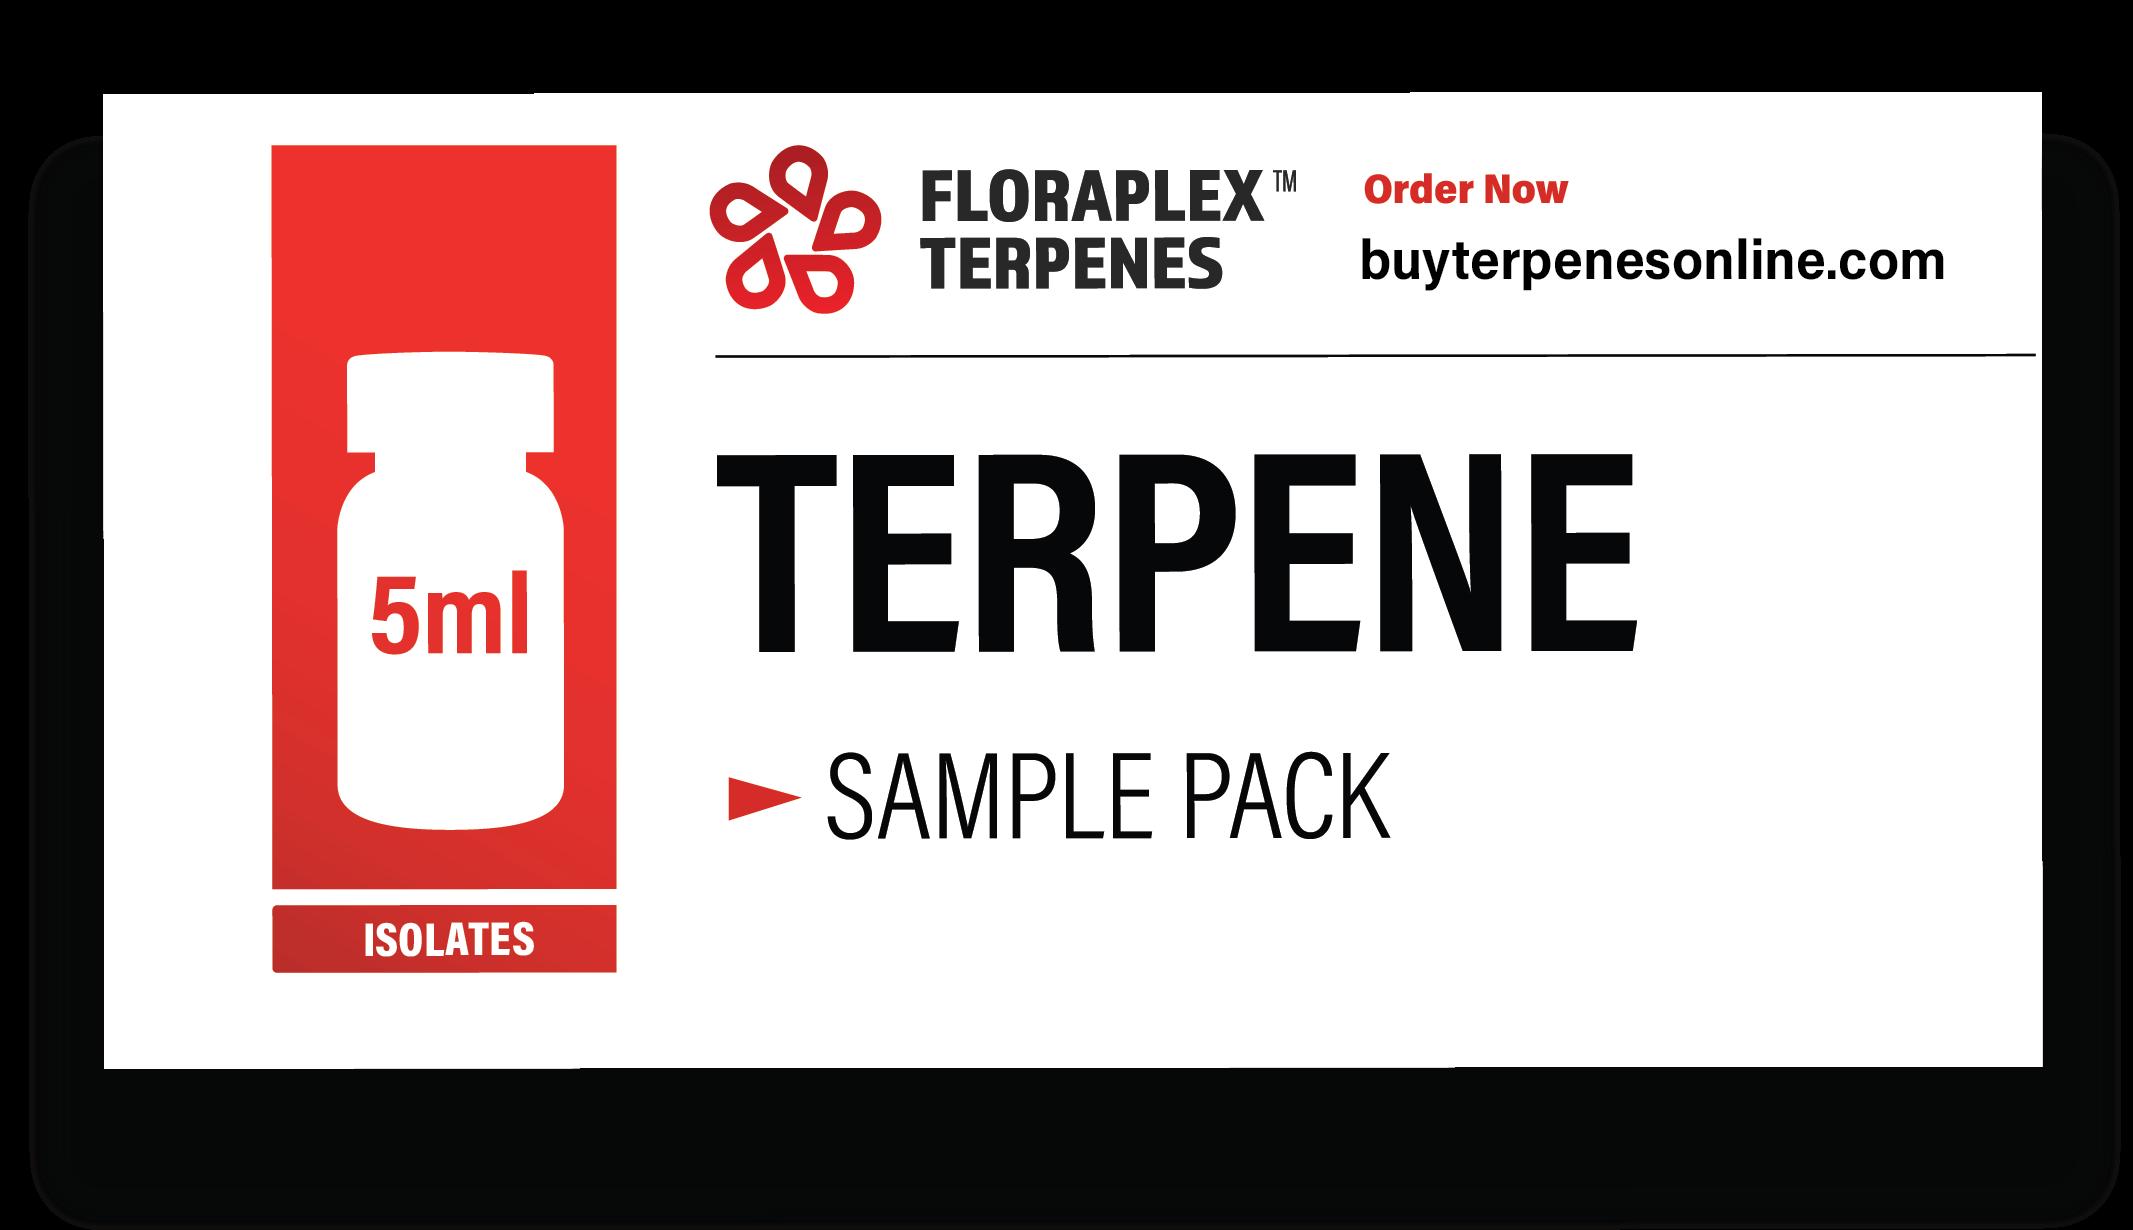 Floraplex Terpene Sample Pack Box